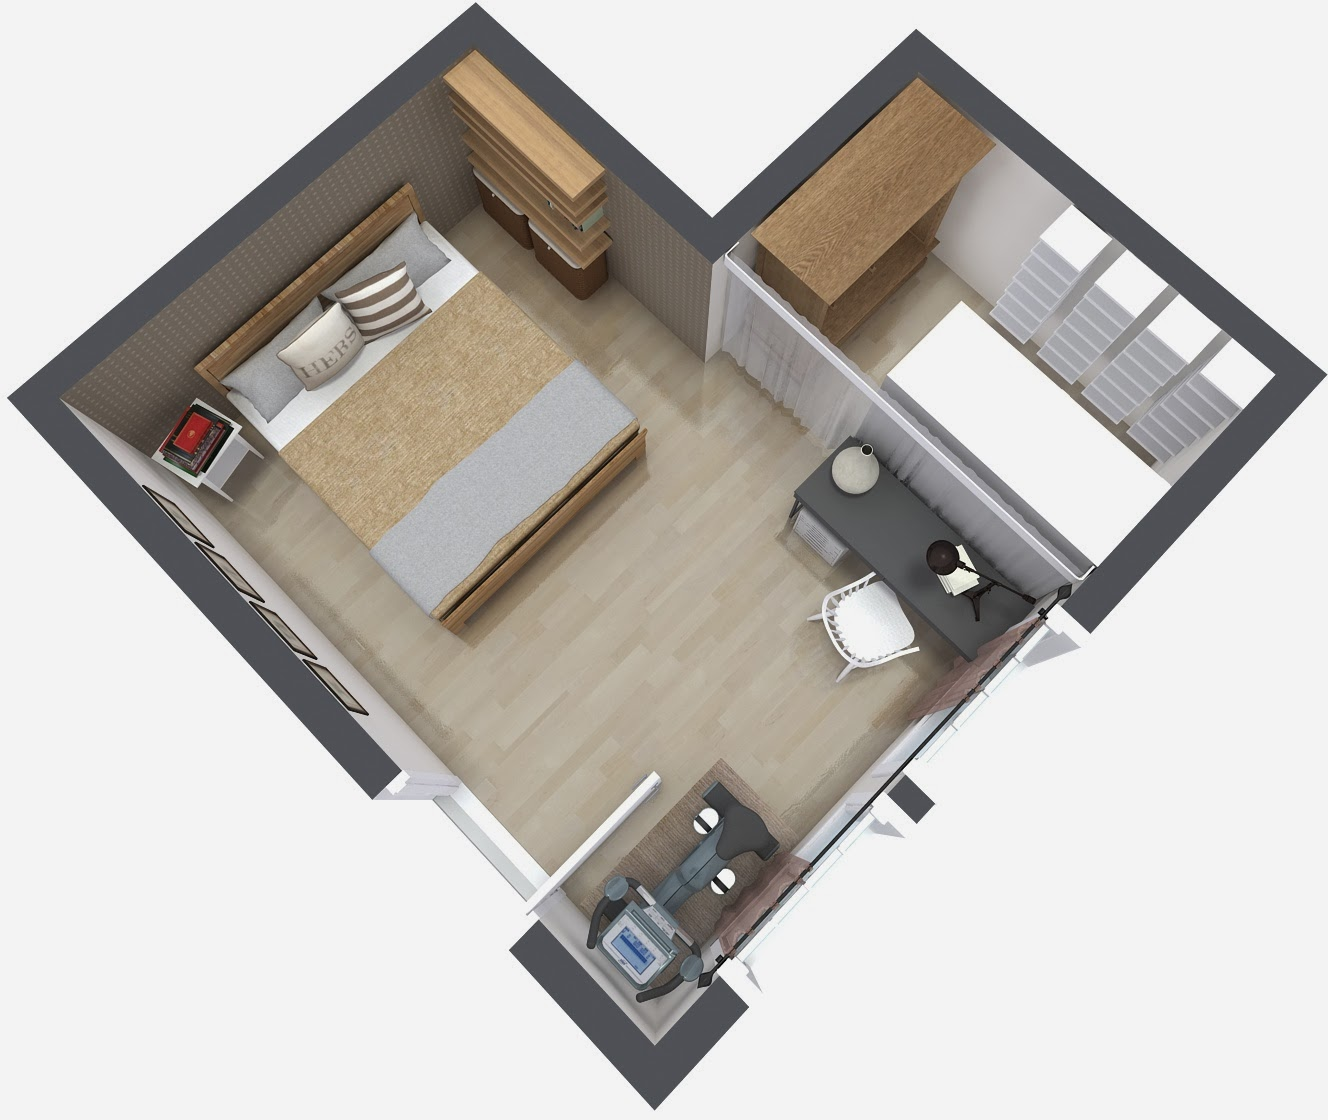 raumplaner programm kostenlos ebenfalls kostenlos with raumplaner programm kostenlos mit einem. Black Bedroom Furniture Sets. Home Design Ideas